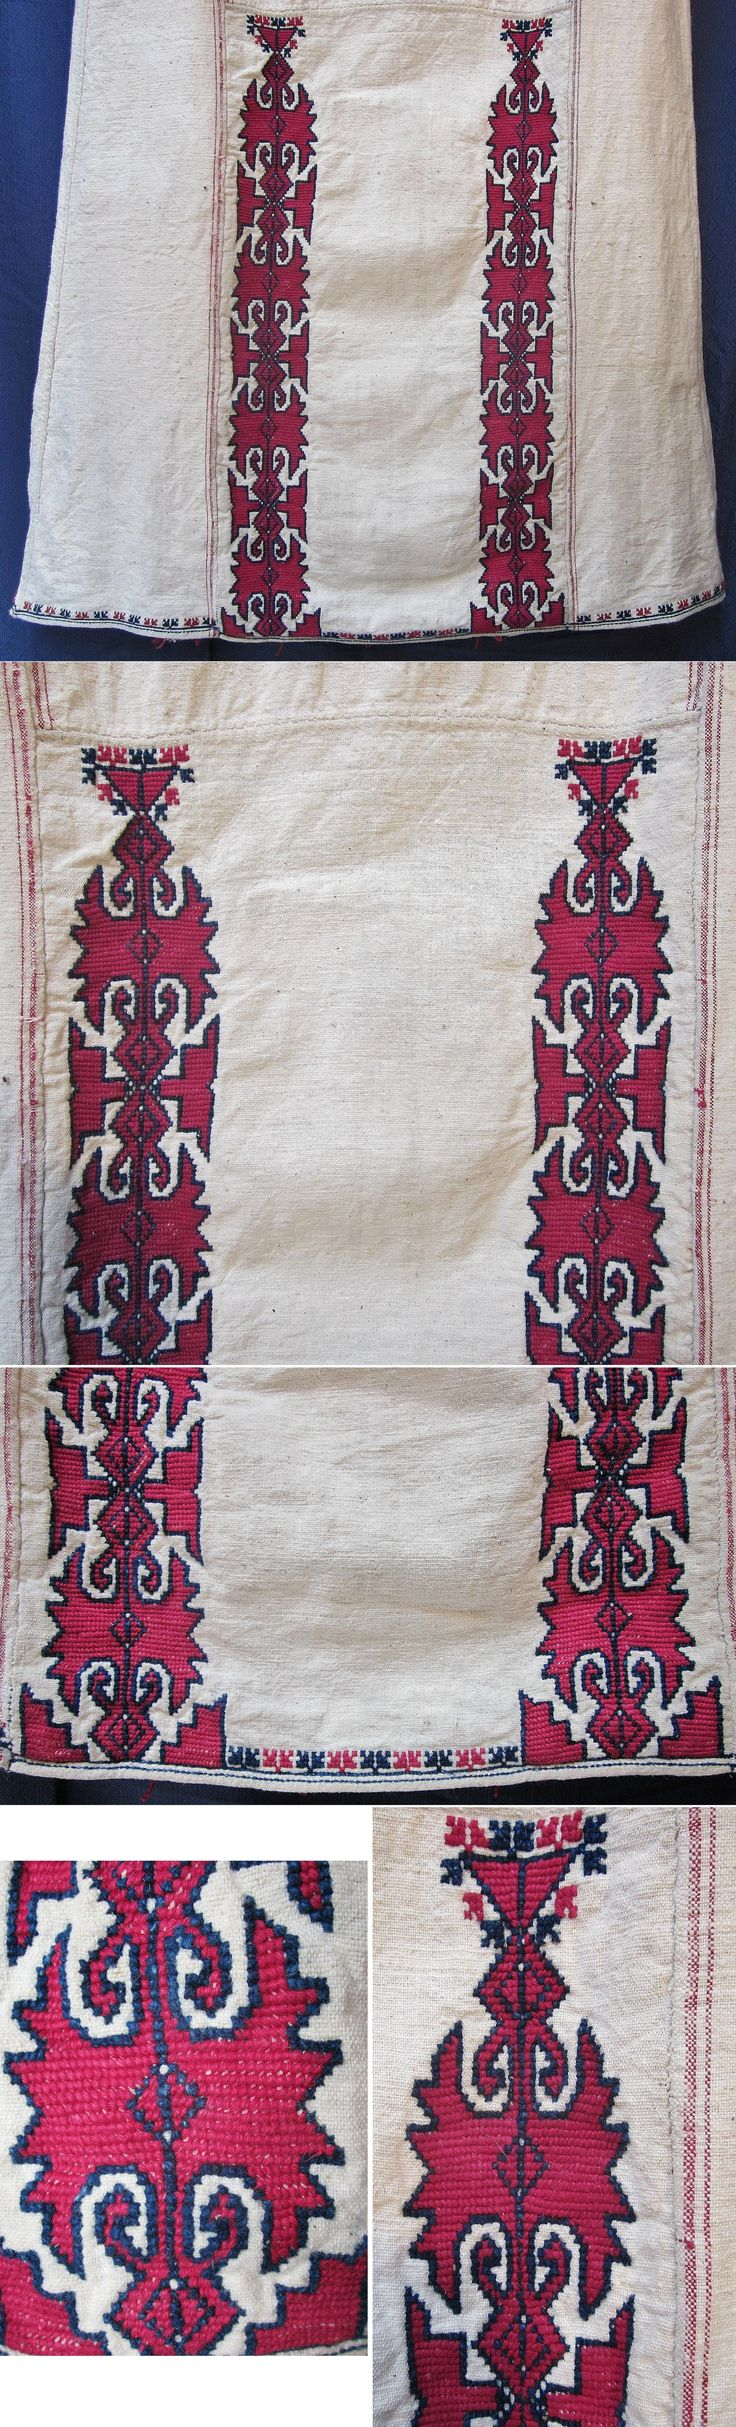 Lower part of the front of a  (cotton on cotton) embroidered 'göynek' (underdress for women), featuring an unusual design.    From the Mudurnu-Taraklı region (Bolu province), mid-20th century.  Ethnic group: Türkmen. (Inv.nr. gnk003 - Kavak Folklor Ekibi & Costume Collection-Antwerpen/Belgium).